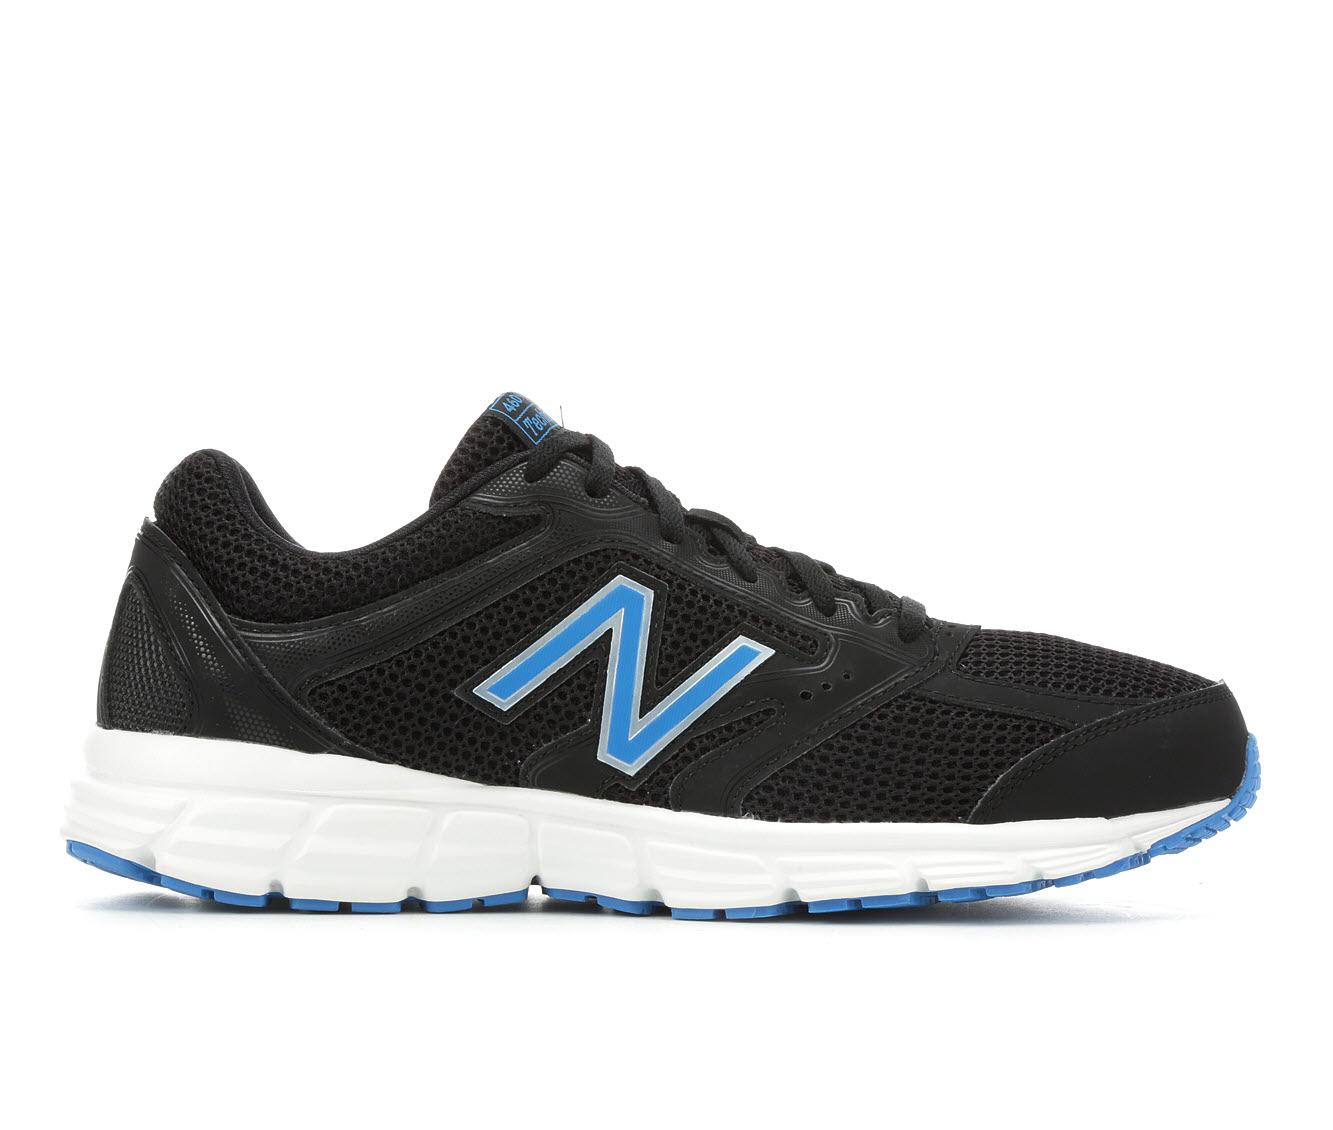 New Balance M460V2 Men's Athletic Shoe